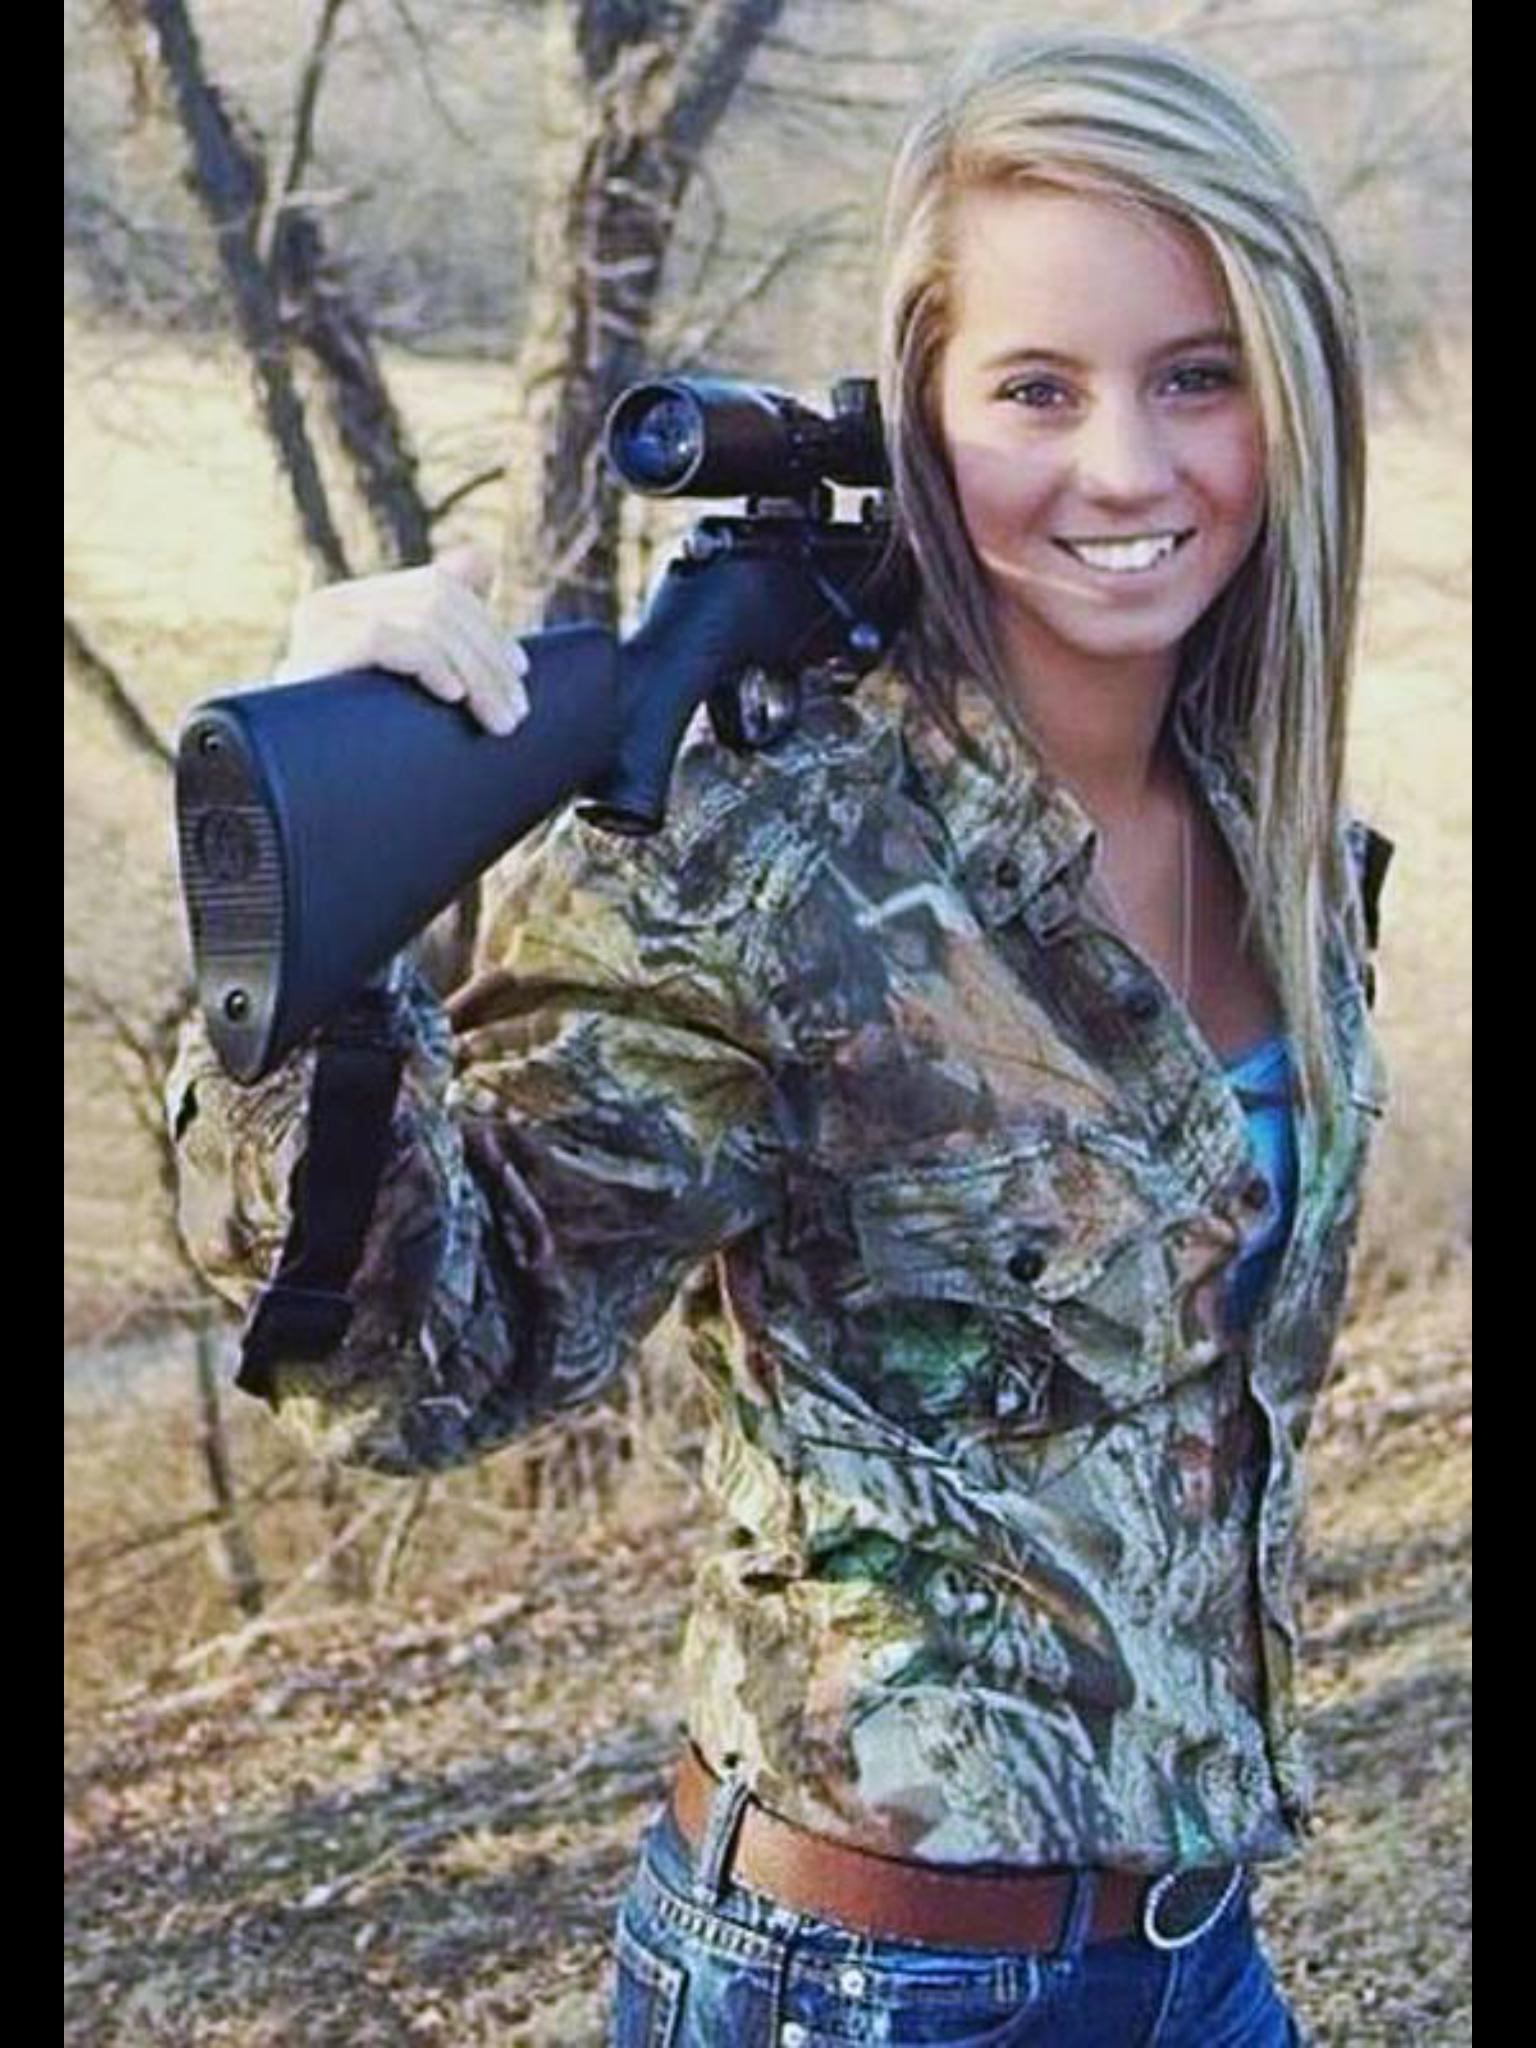 Hot girls hunting Pin By Jennifer Rohen On Women And Guns Military Girl Girl Guns Women Guns